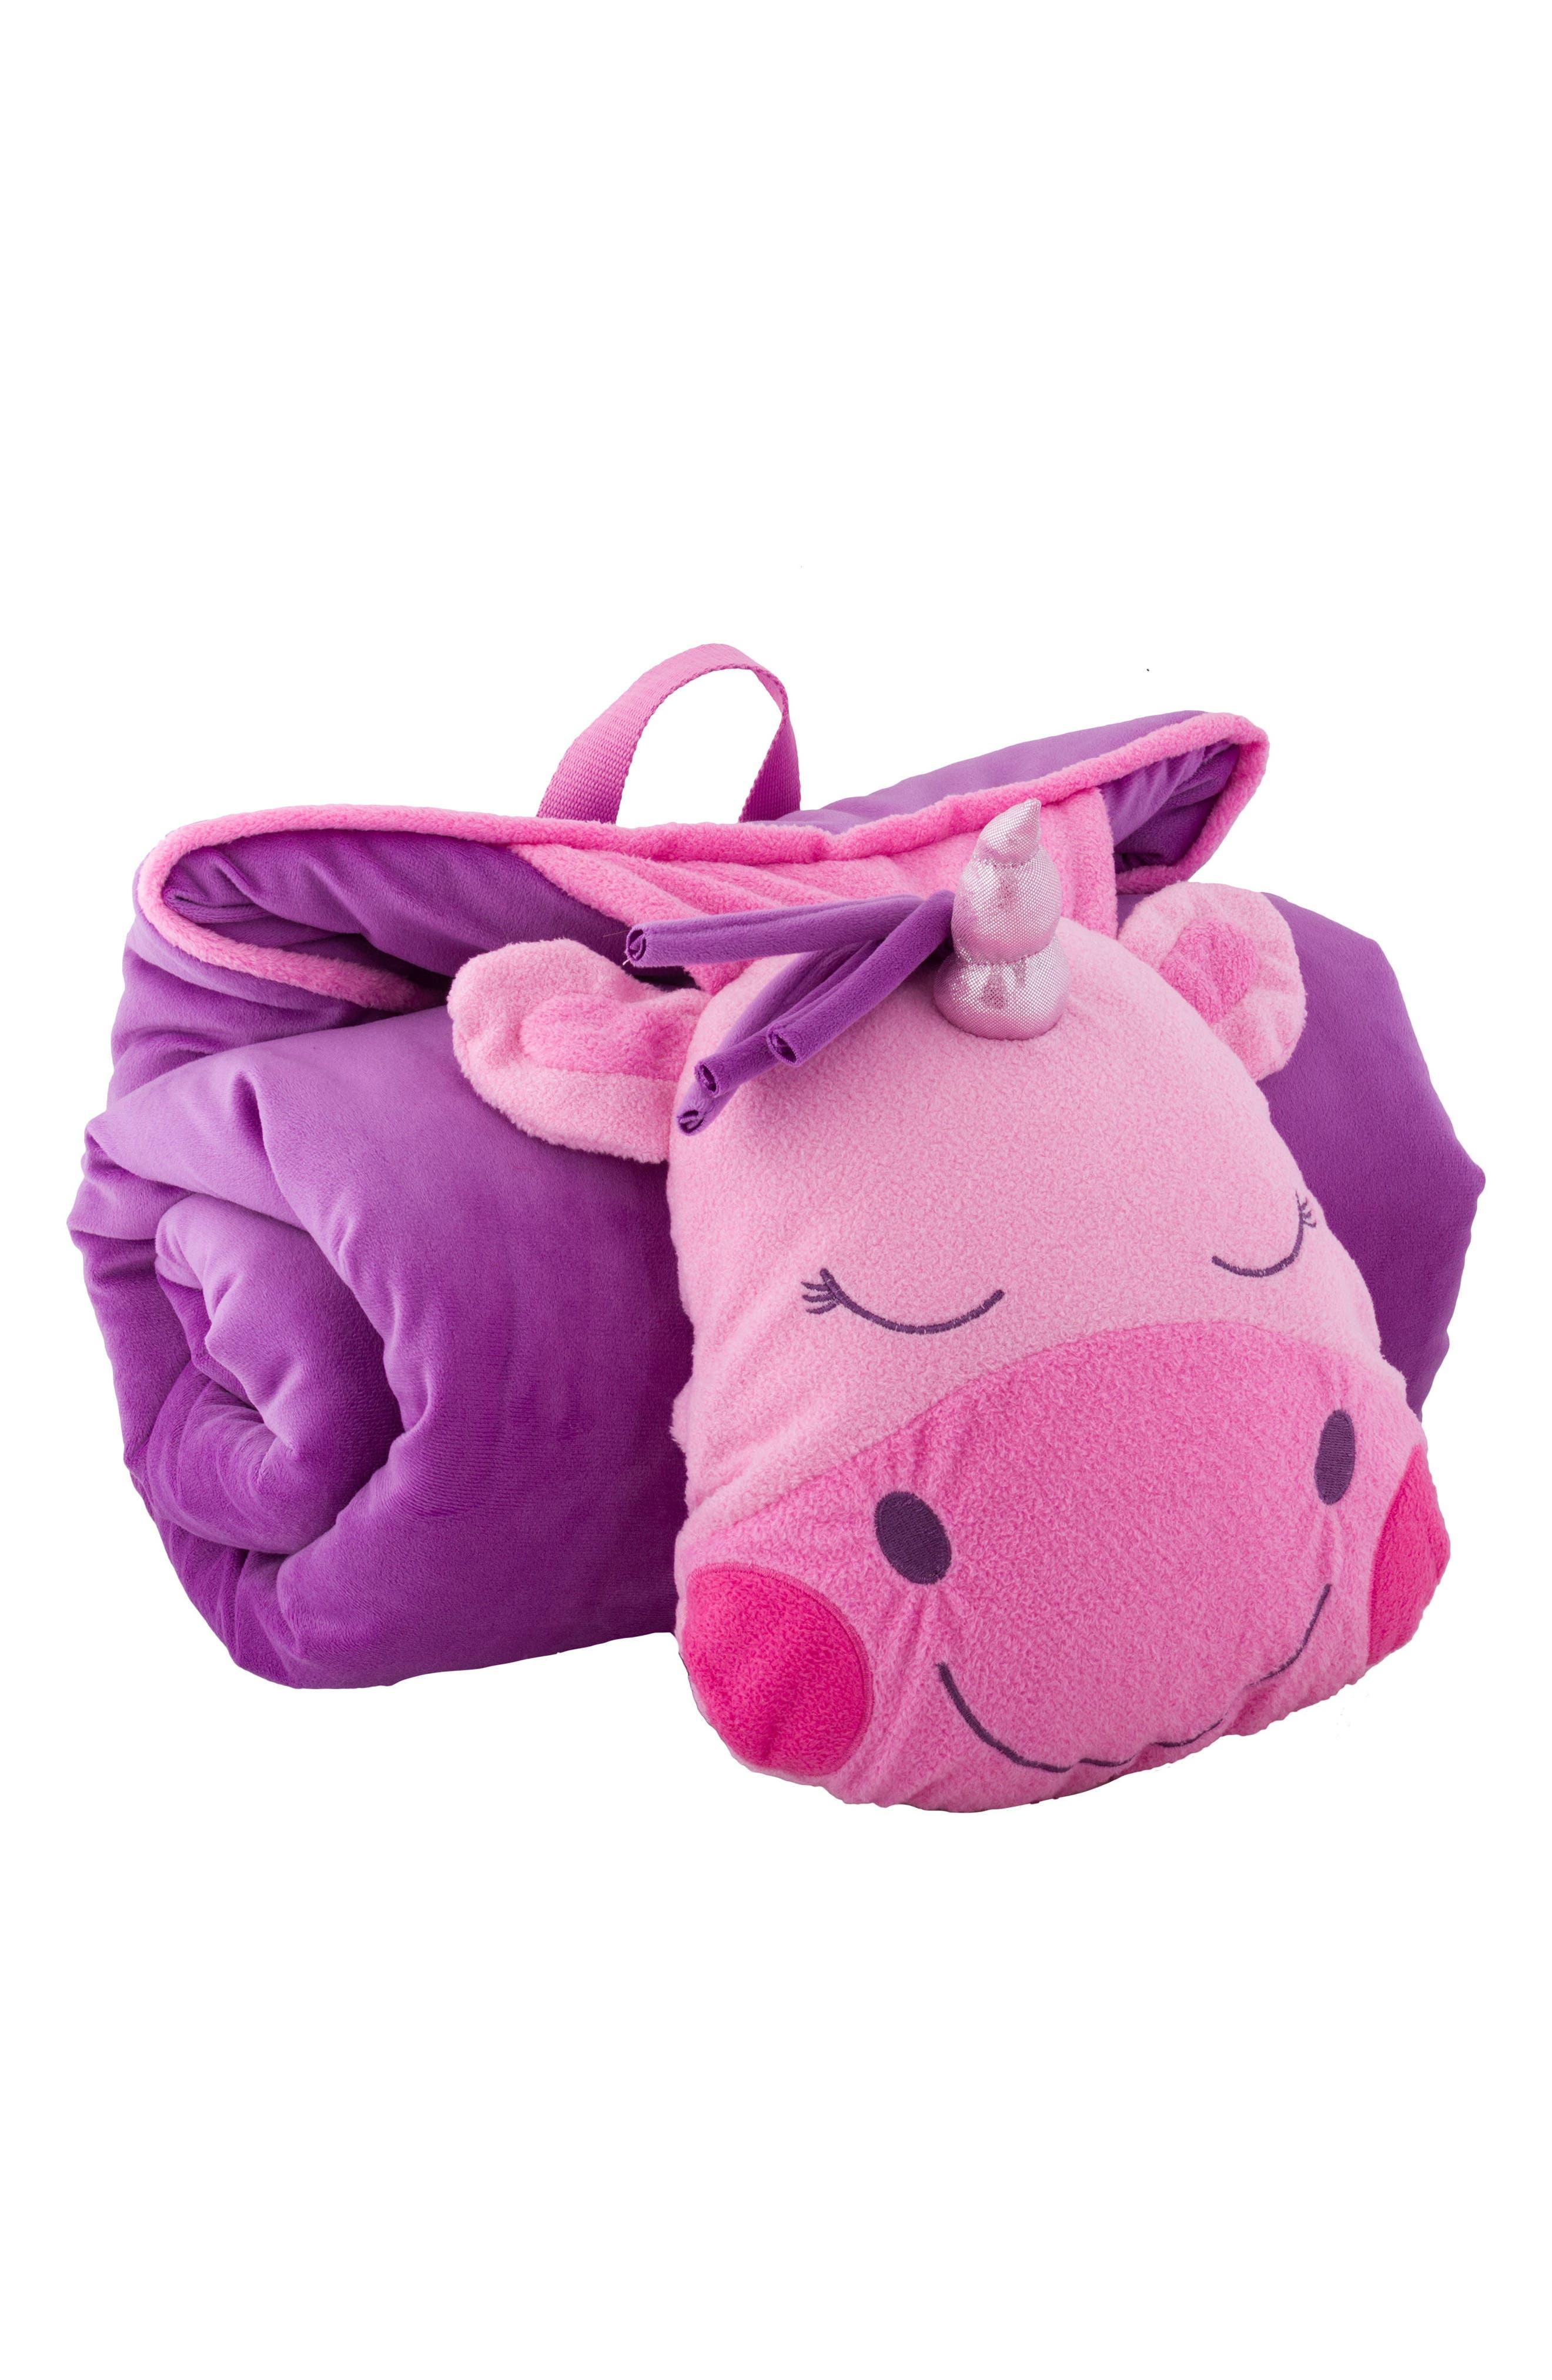 Portable Nap Mat, Pillow & Blanket,                             Main thumbnail 1, color,                             UNICORN